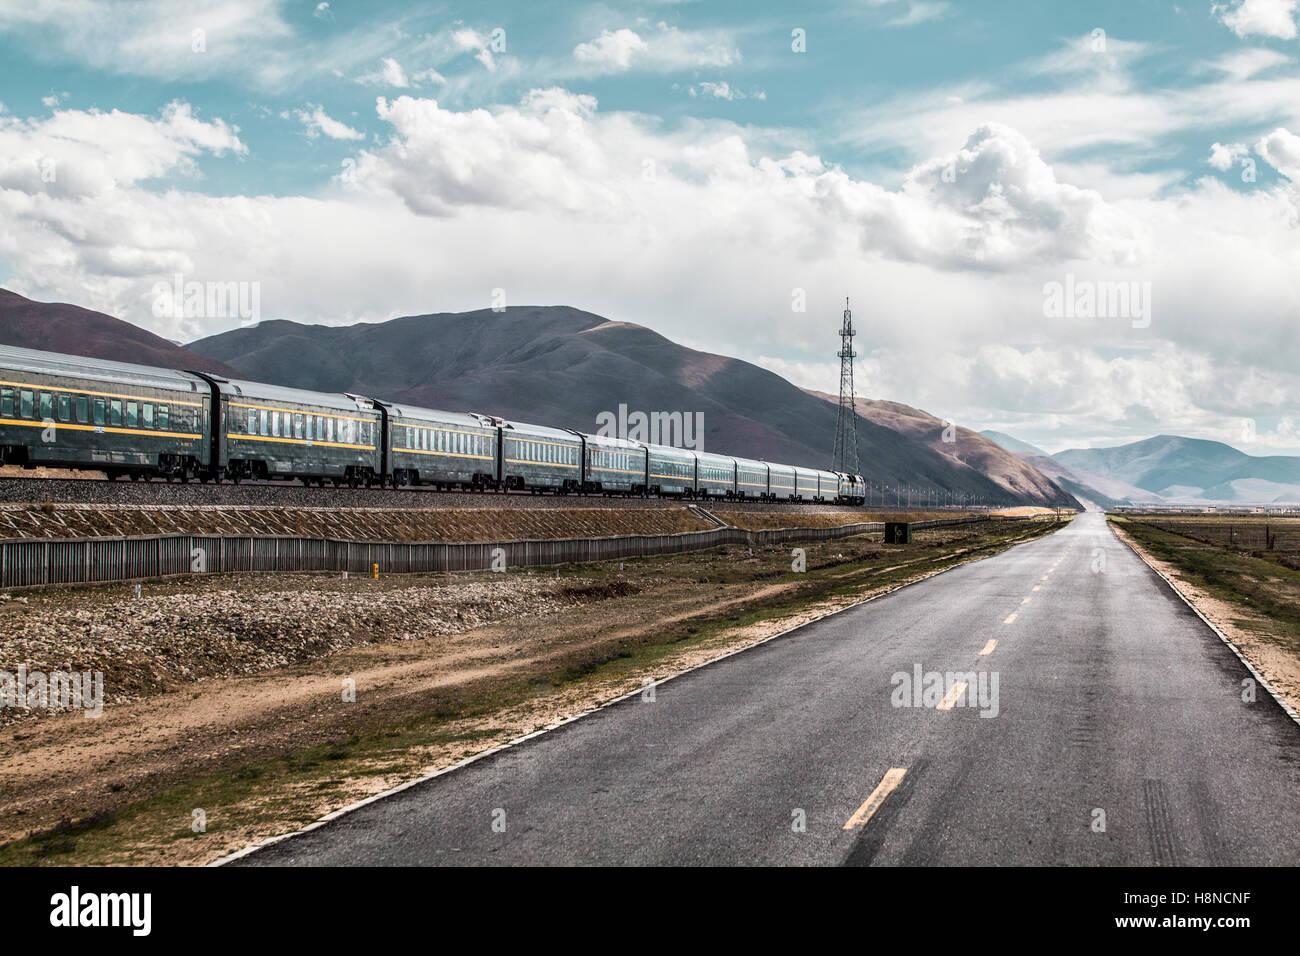 Qinghai-Tibet railway and highway, China - Stock Image